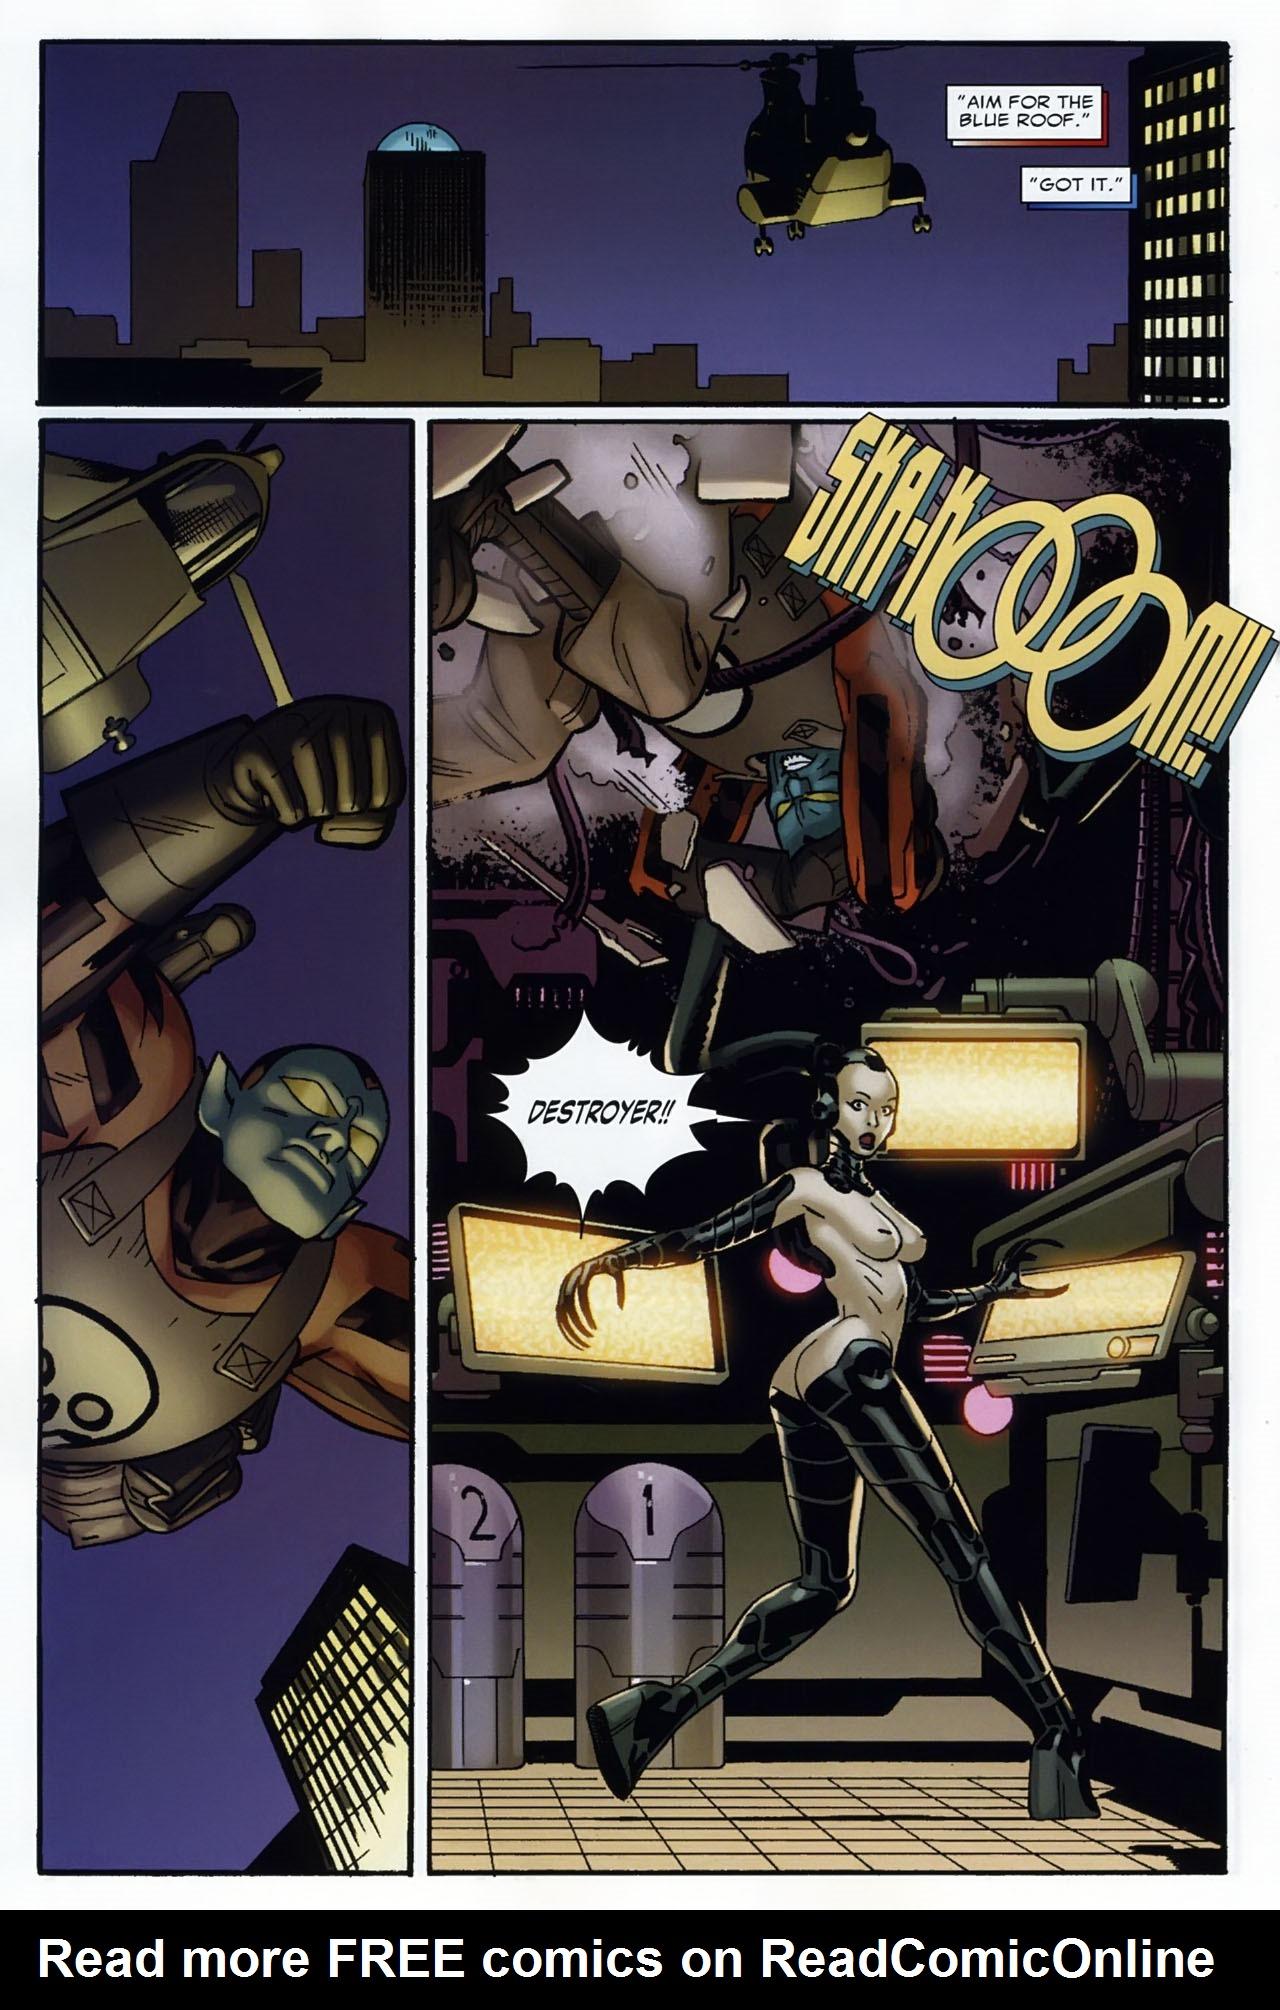 Read online Destroyer comic -  Issue #2 - 14